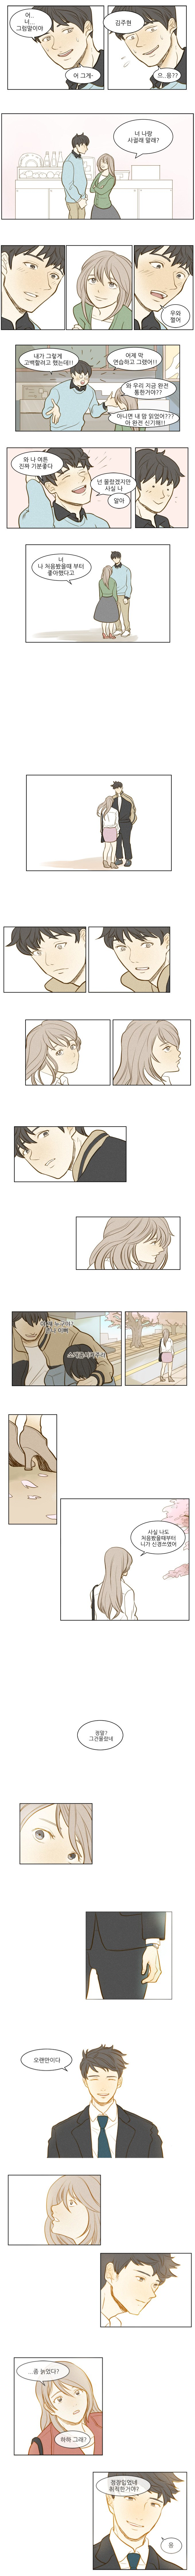 7.jpg 시간은 거꾸로 흐른다.manga [BGM] 시간은 거꾸로 간다.manhwa